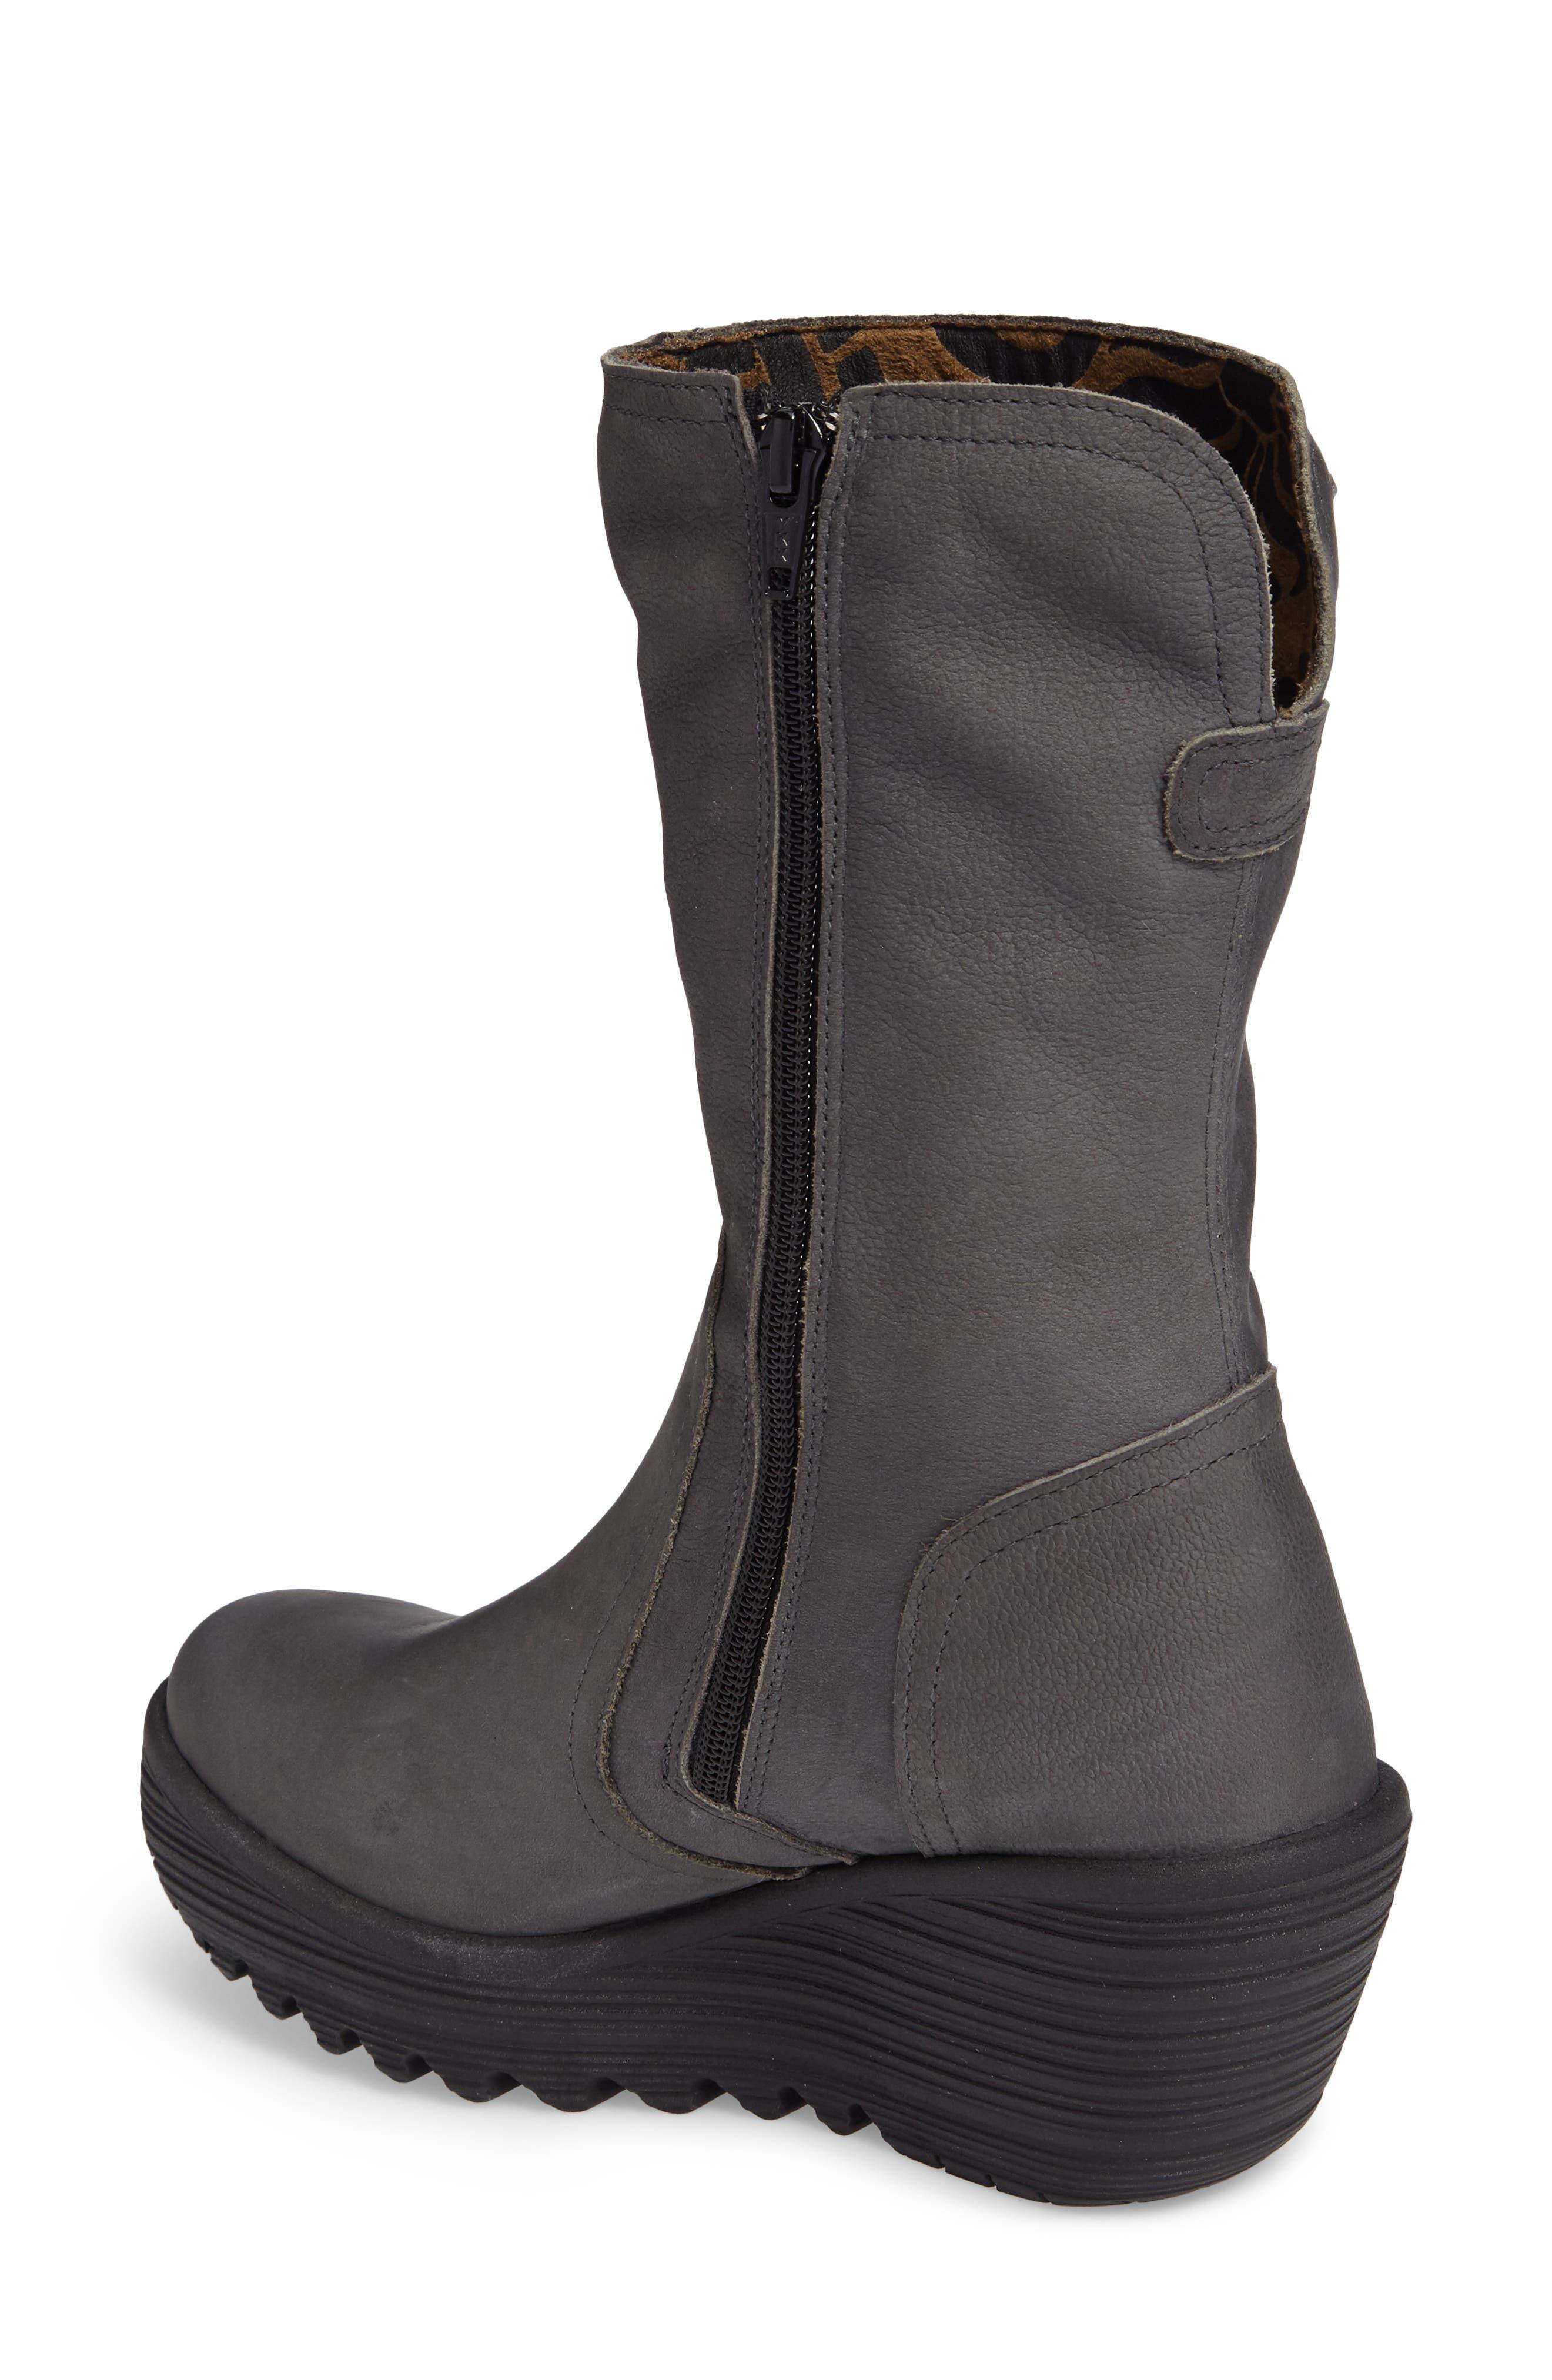 Alternate Image 2  - Fly London Yups Waterproof Gore-Tex® Wedge Boot (Women)